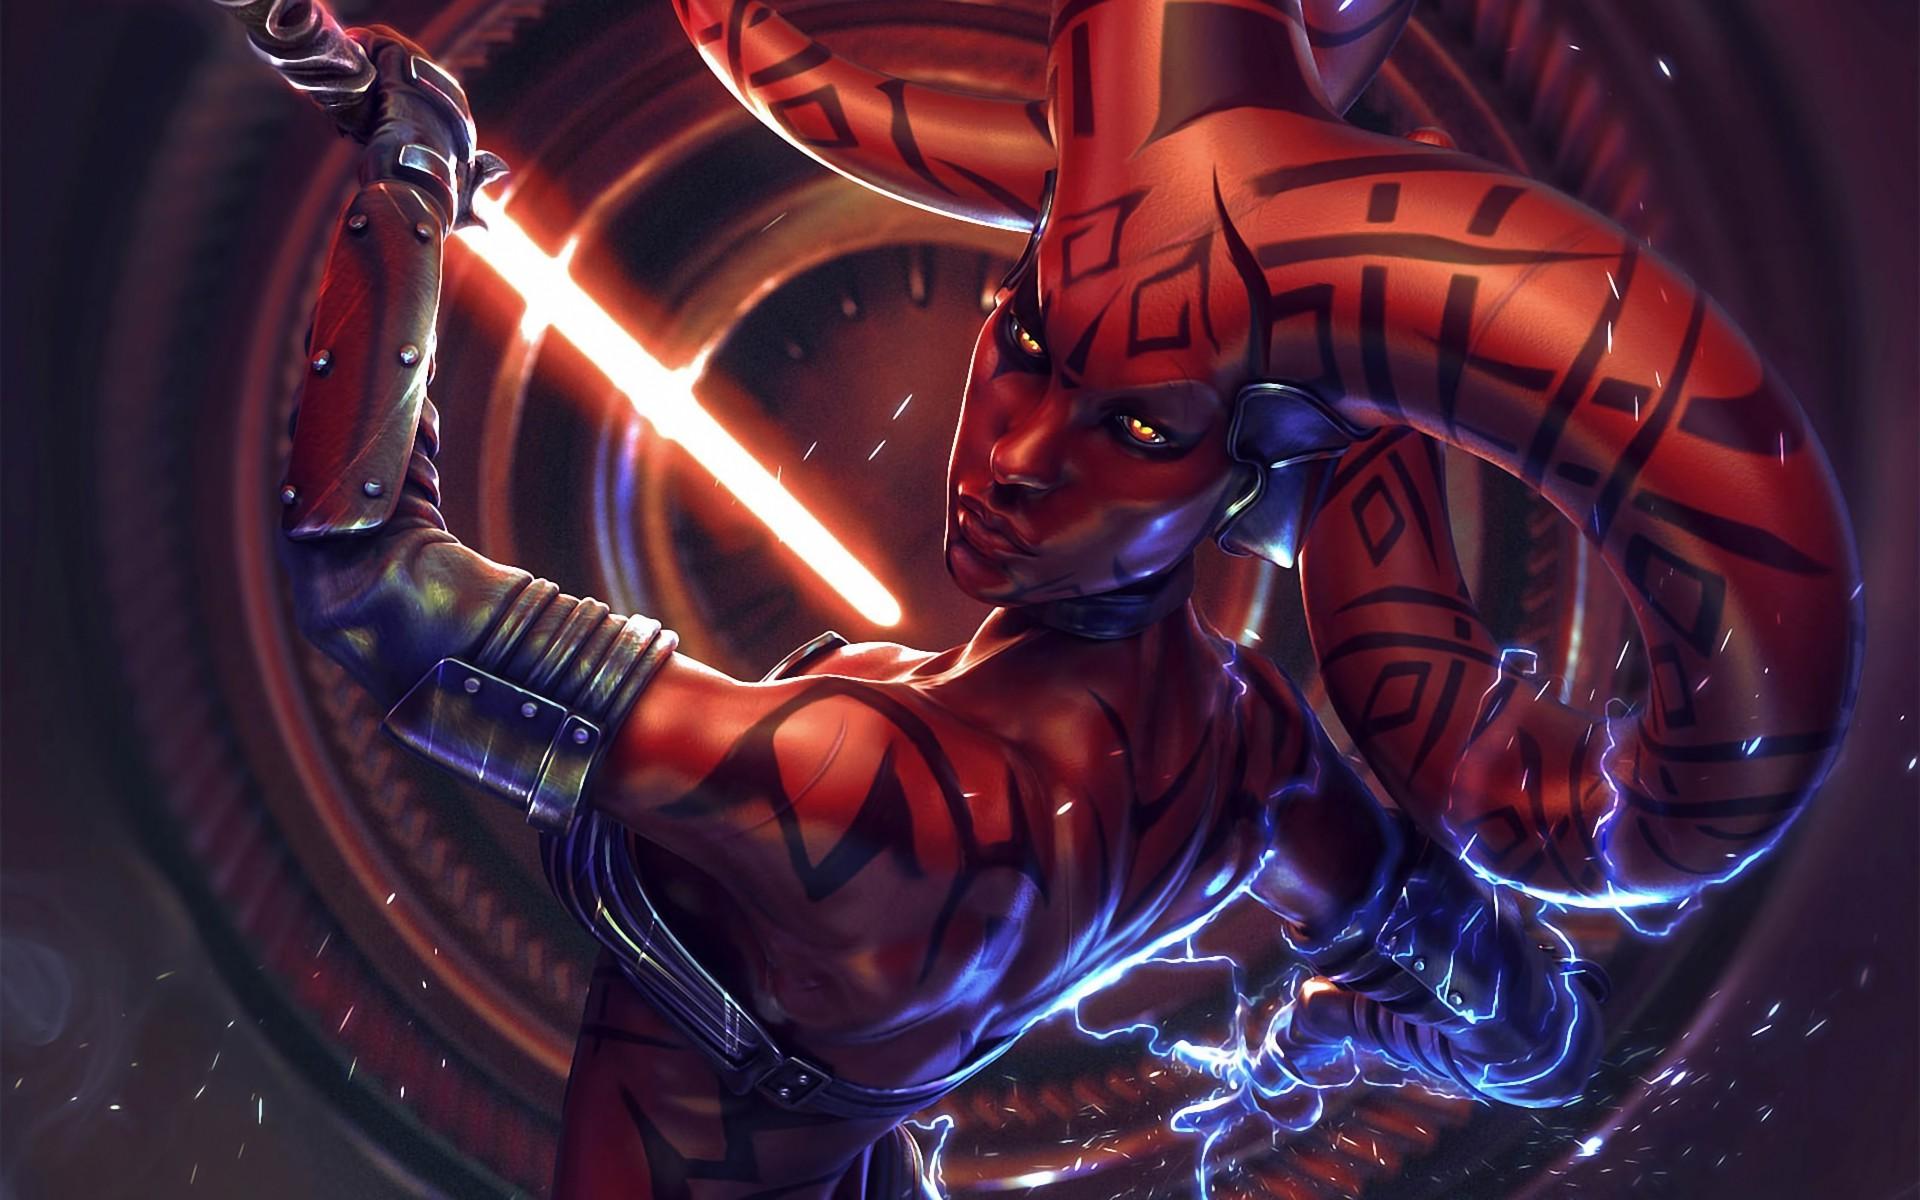 Wallpaper Star Wars Space Demon Darth Talon Darkness Graphics